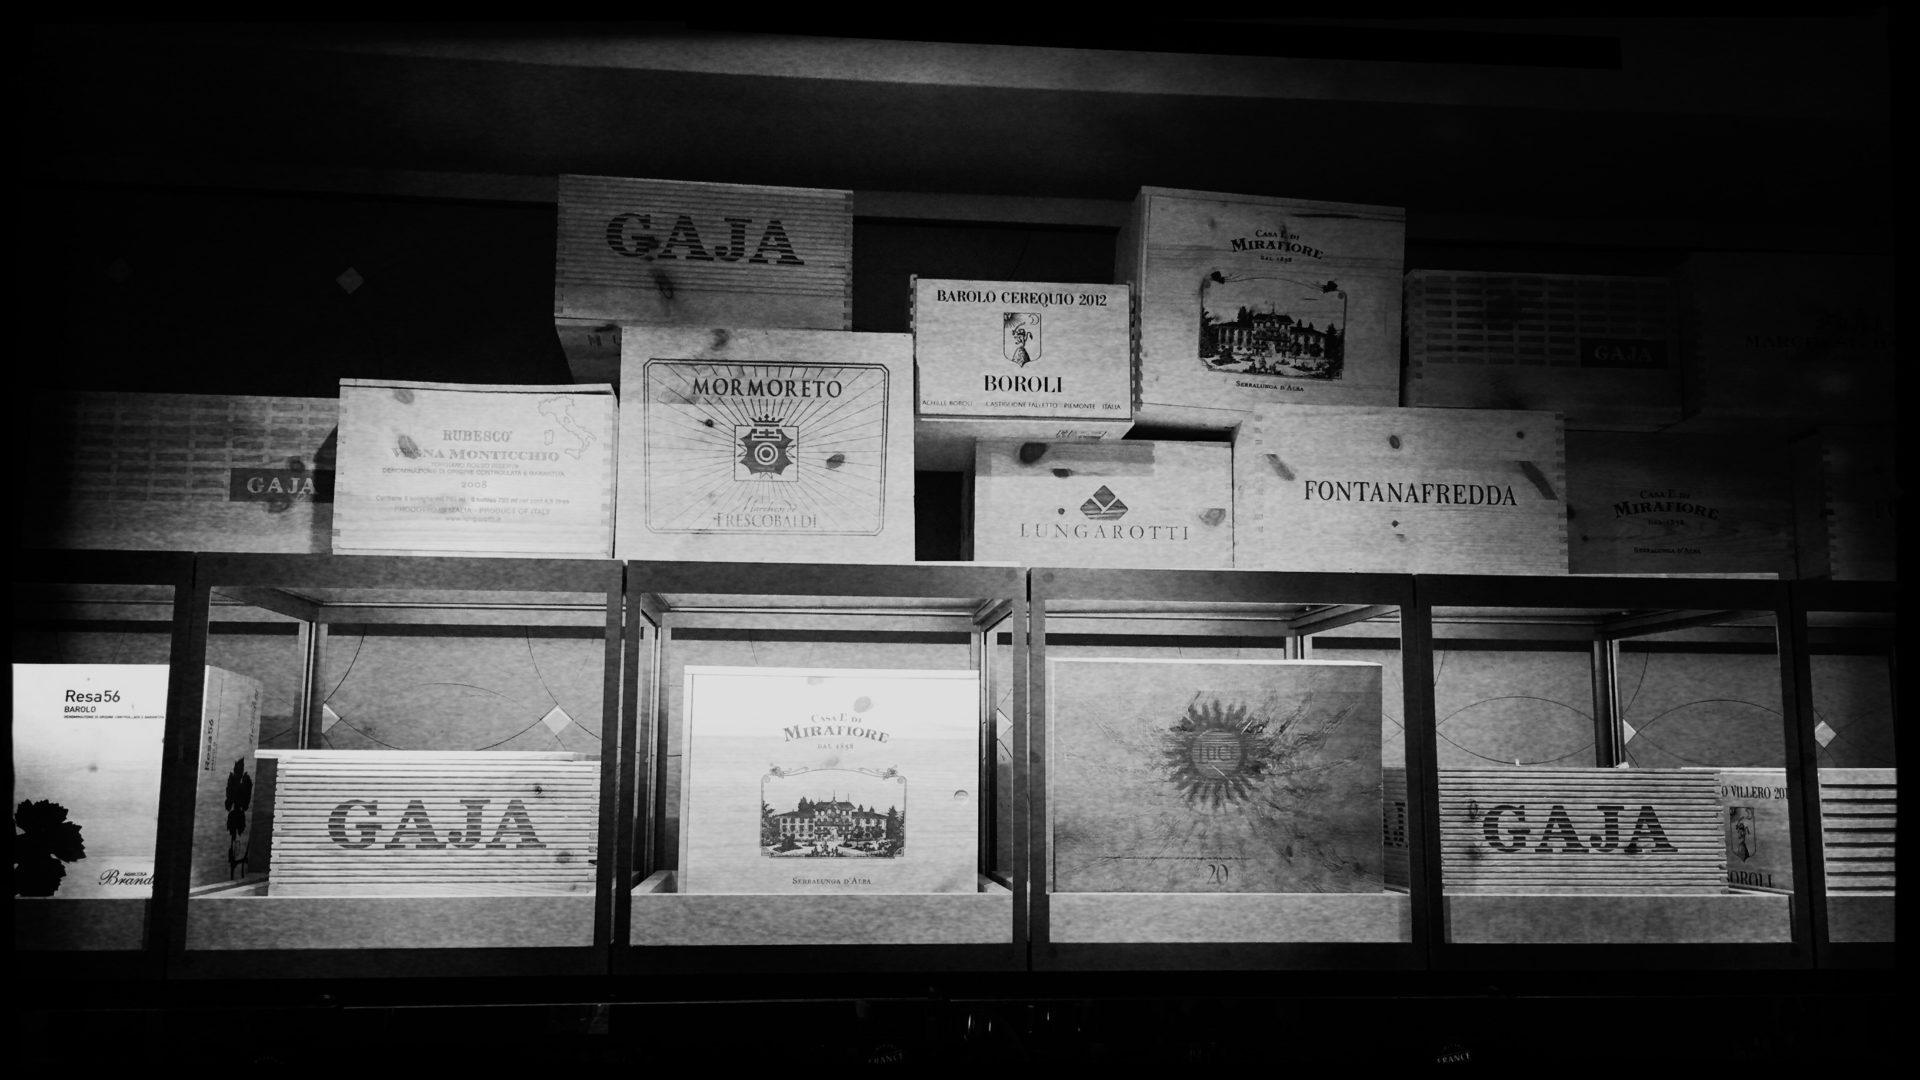 Weinkeller der Fondazione Tedeschi in Venedig